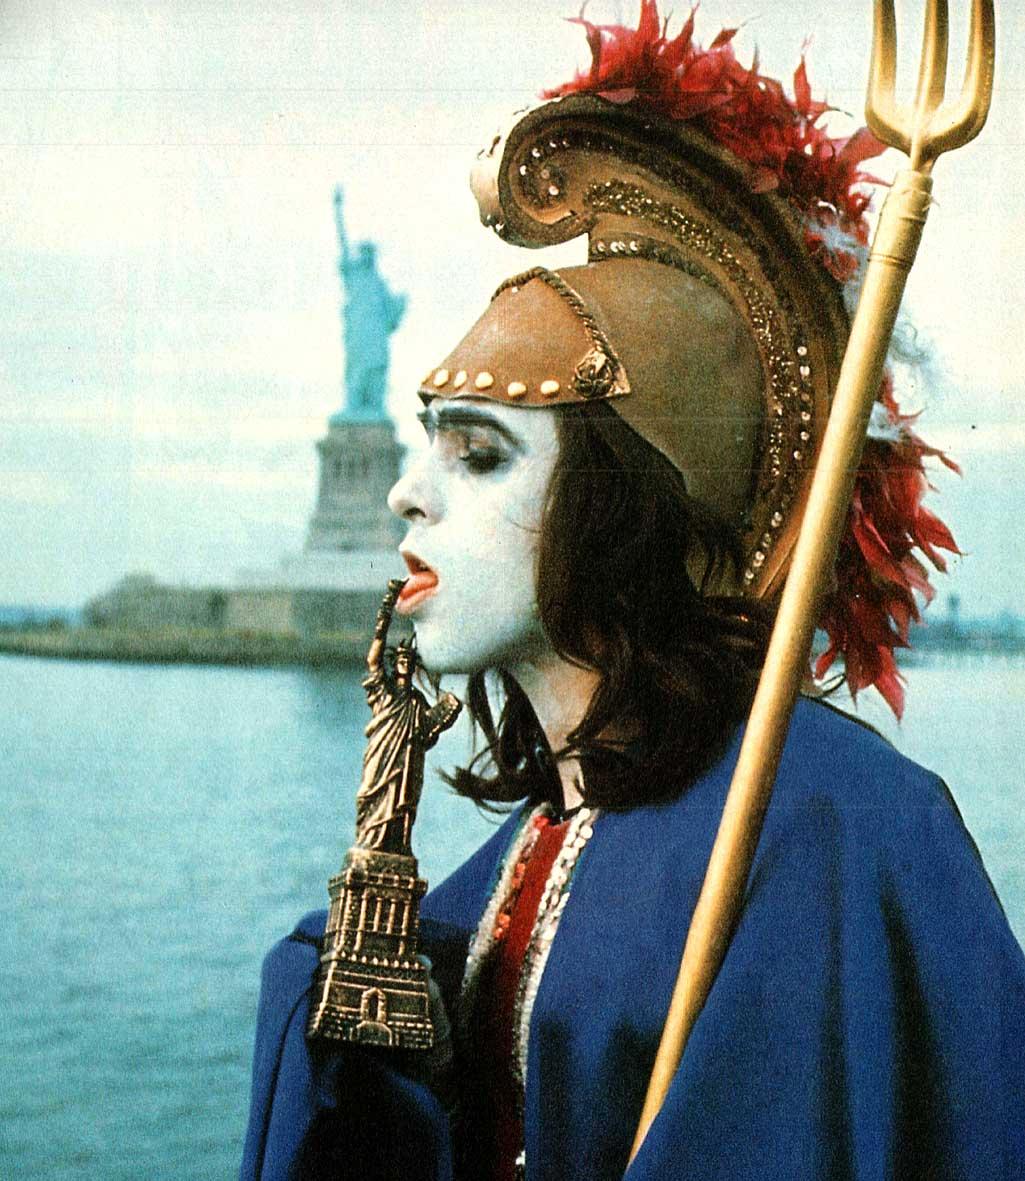 Flashback: Peter Gabriel y Brian Eno, pioneros del glam